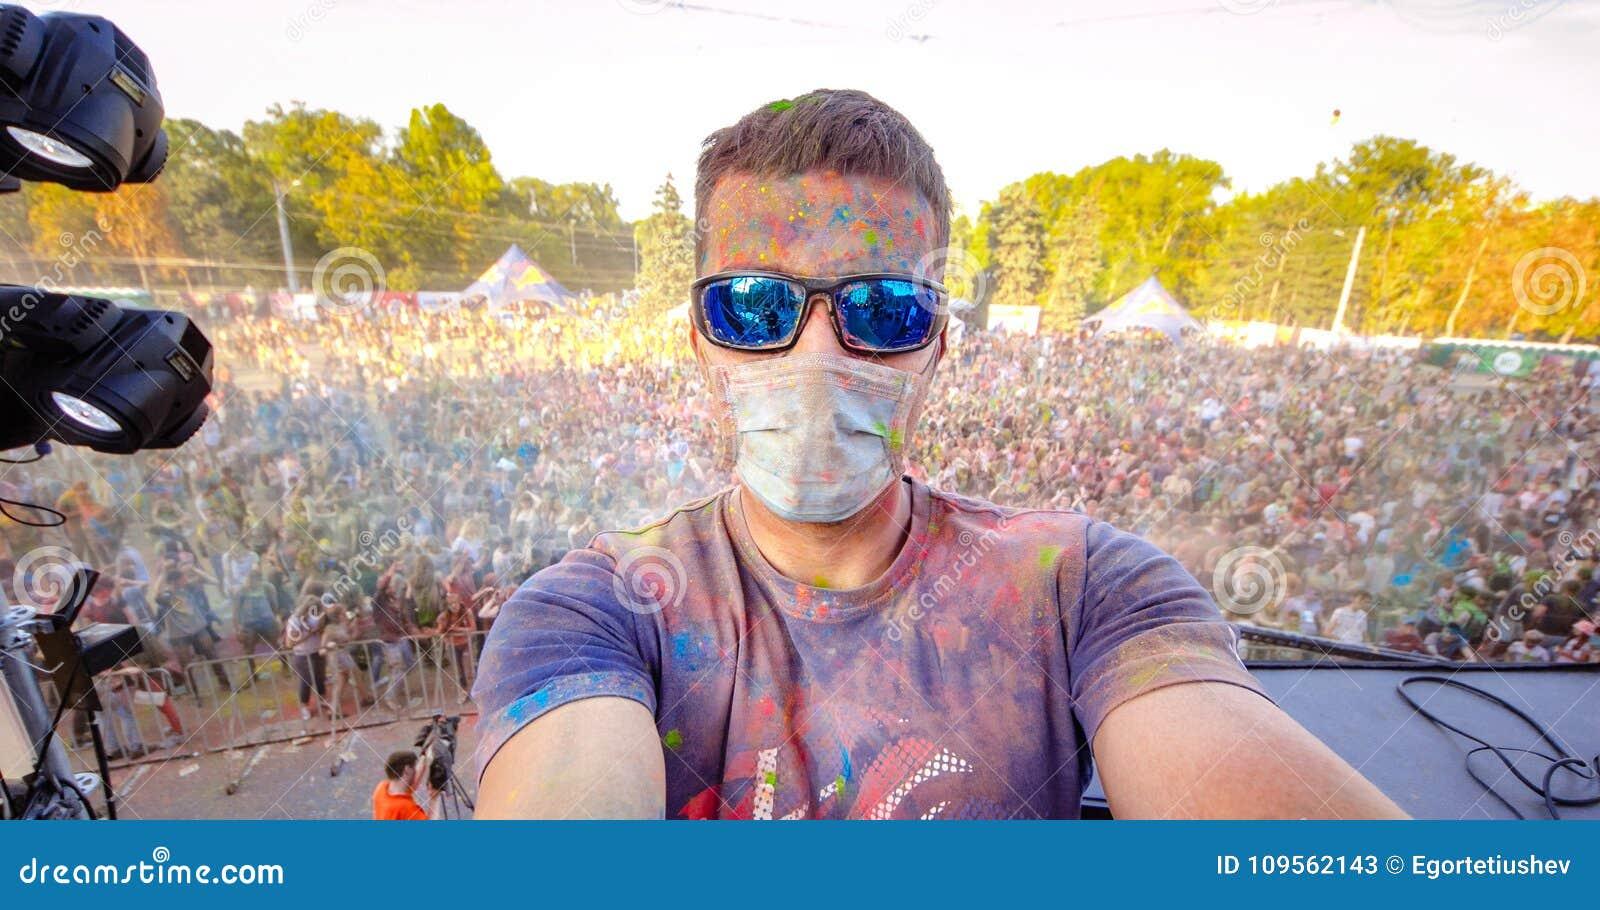 Фестиваль цвета 9-ое сентября 2017 Молдавии Chisinau Дарвина торжества Holi